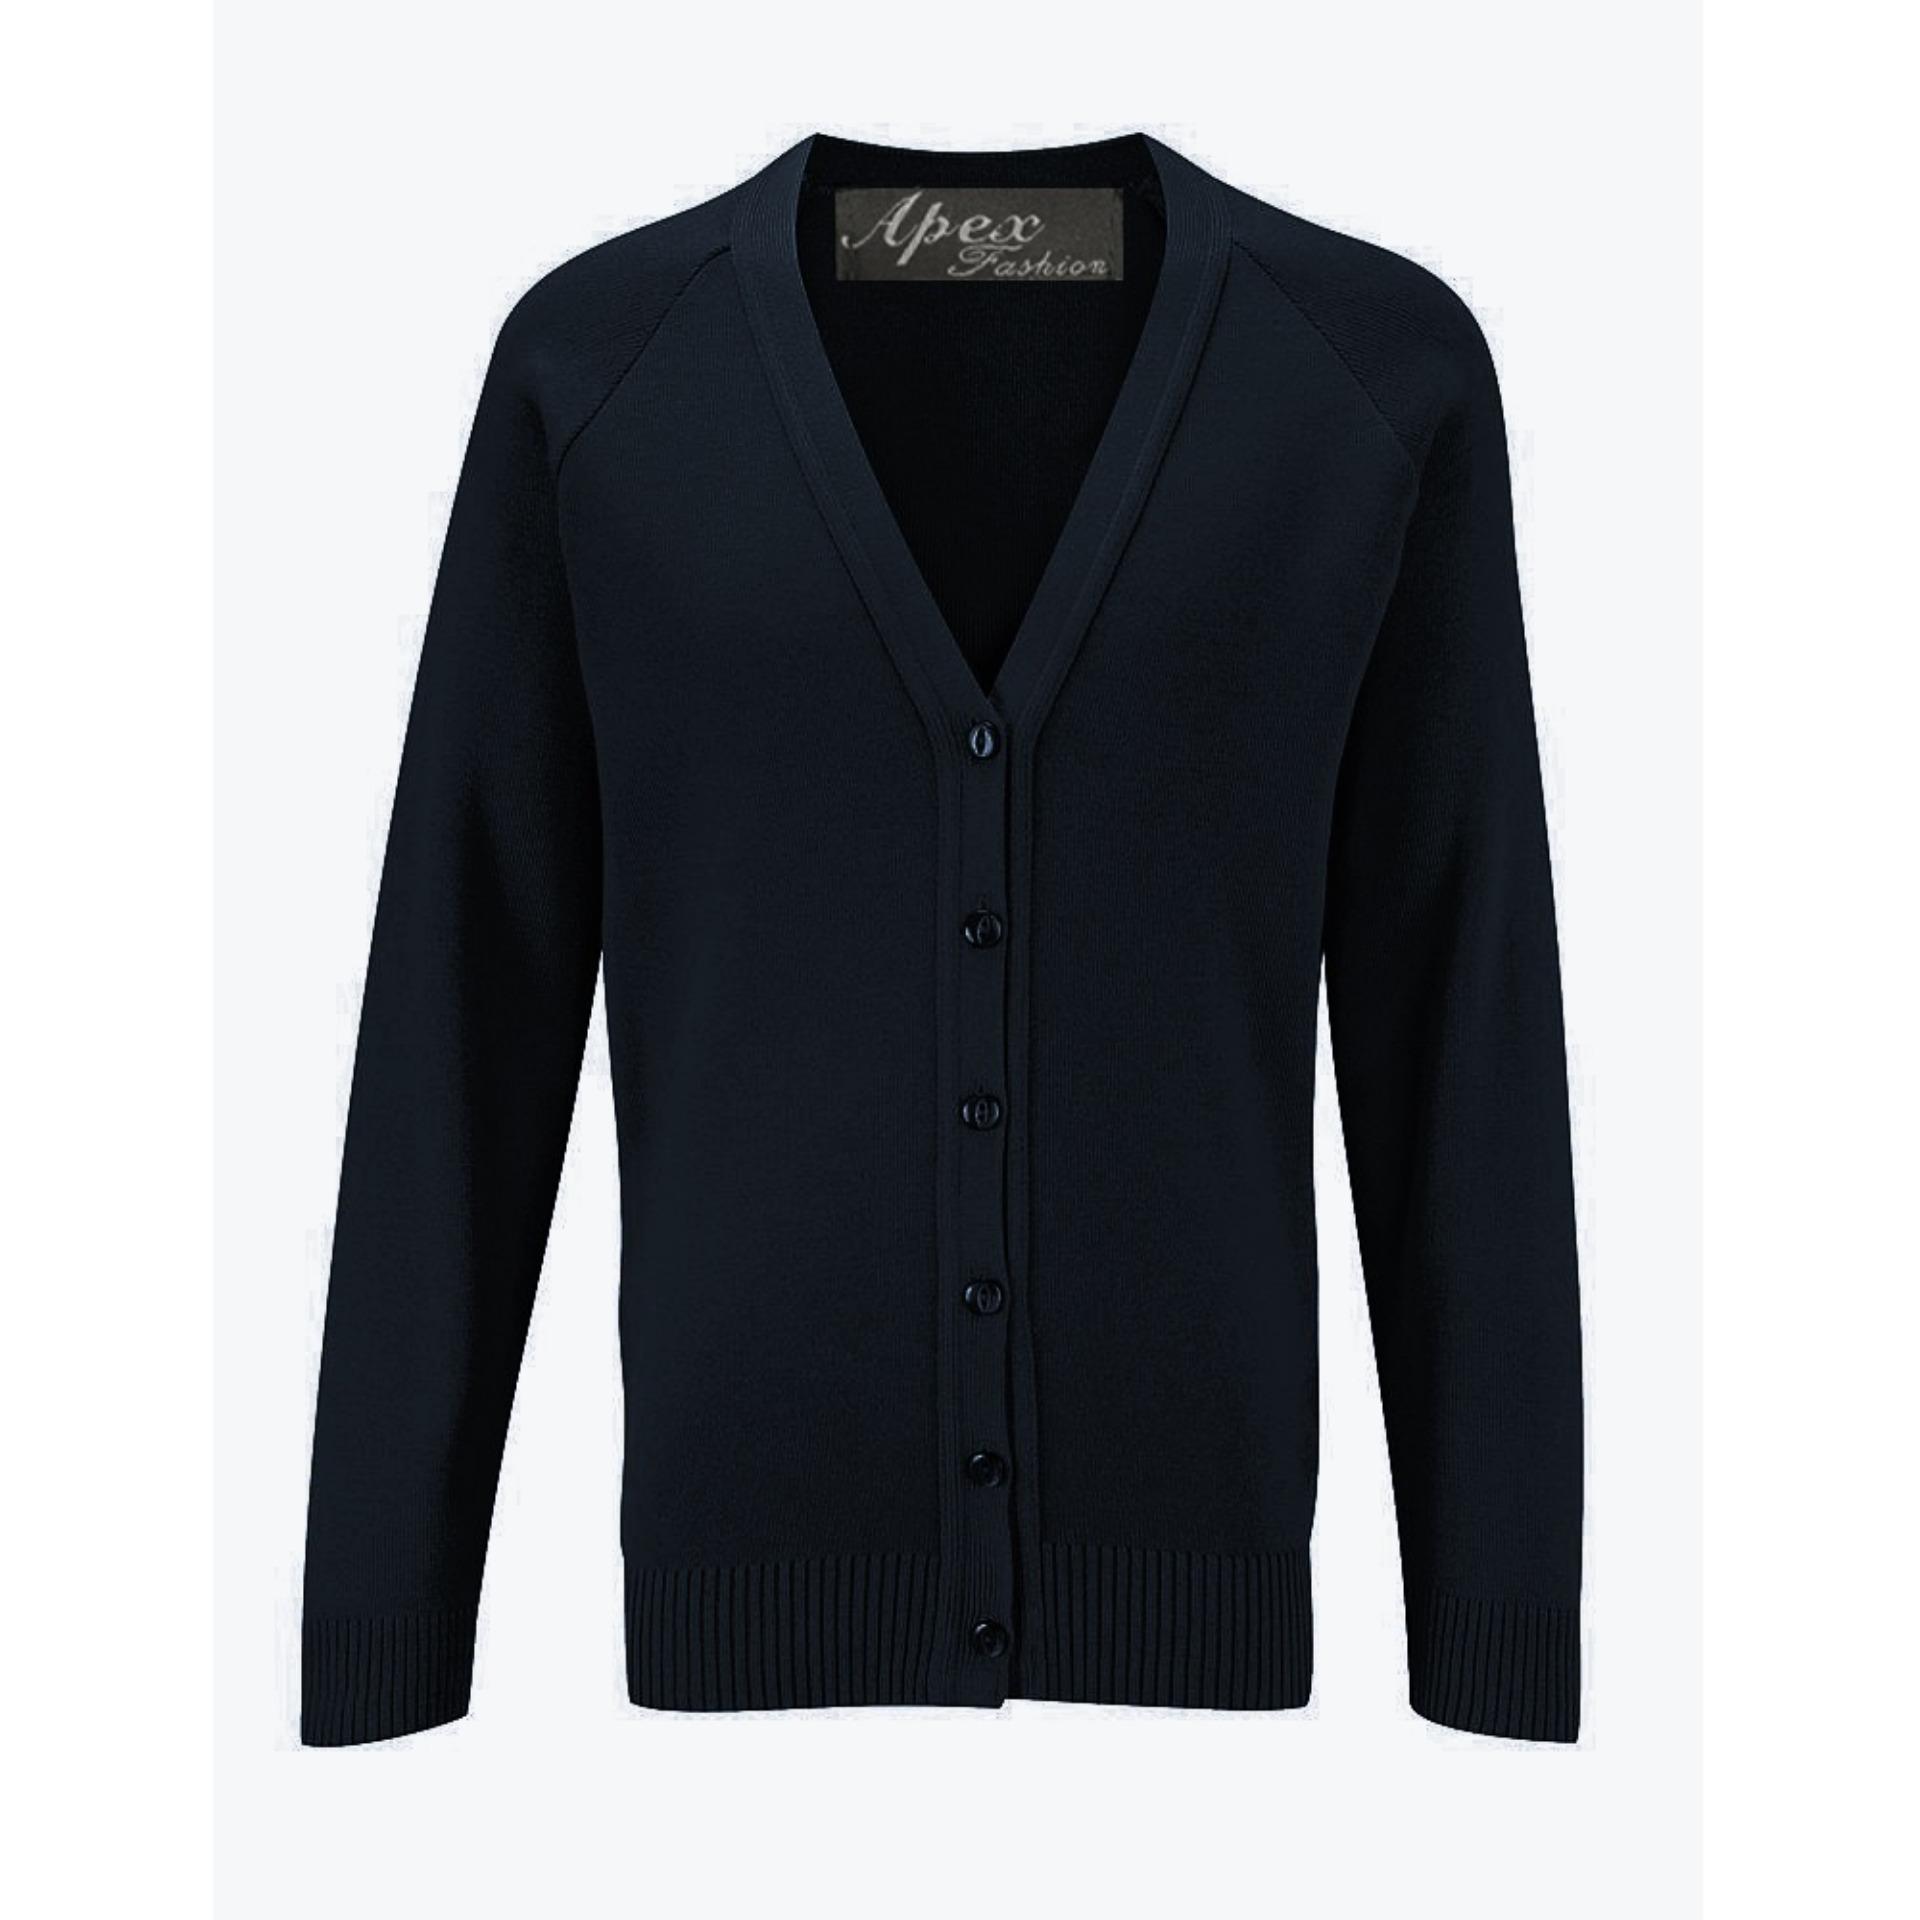 Aó Len Nam Apex Fashion – 21576A ( XANH NAVY)